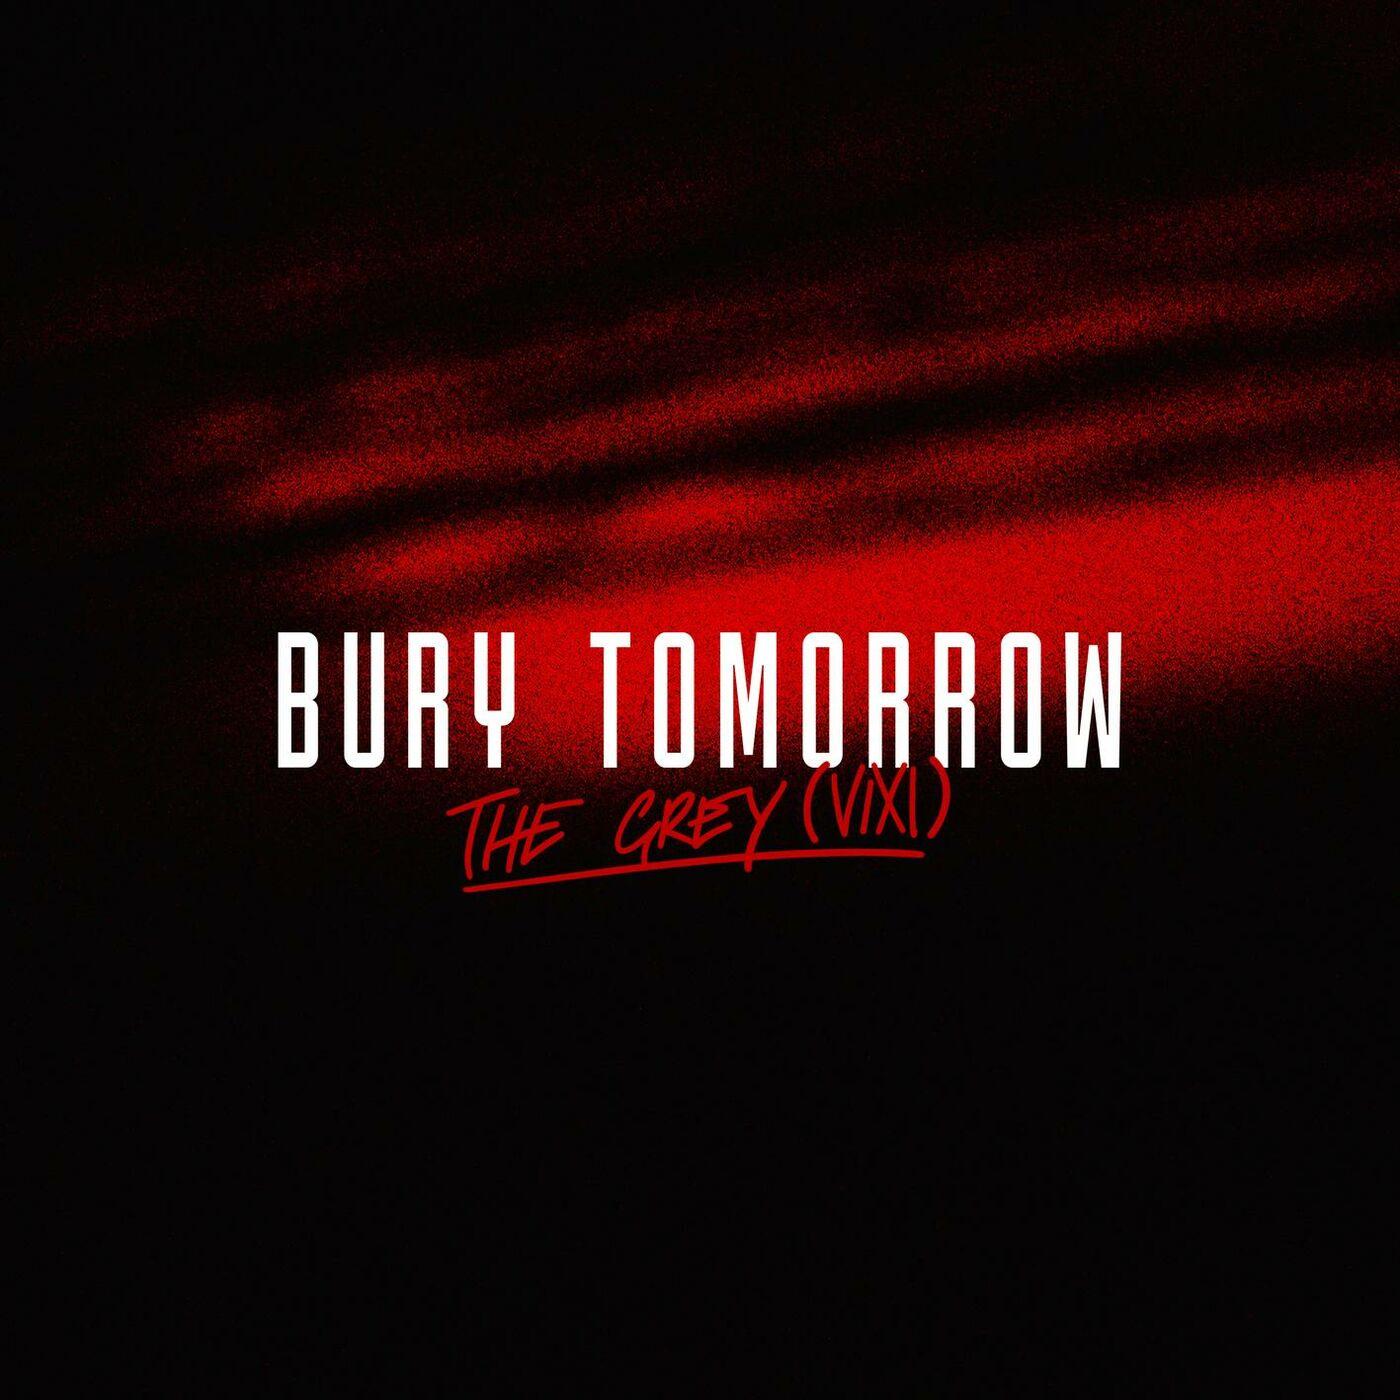 Bury Tomorrow - The Grey (VIXI) [single] (2019)